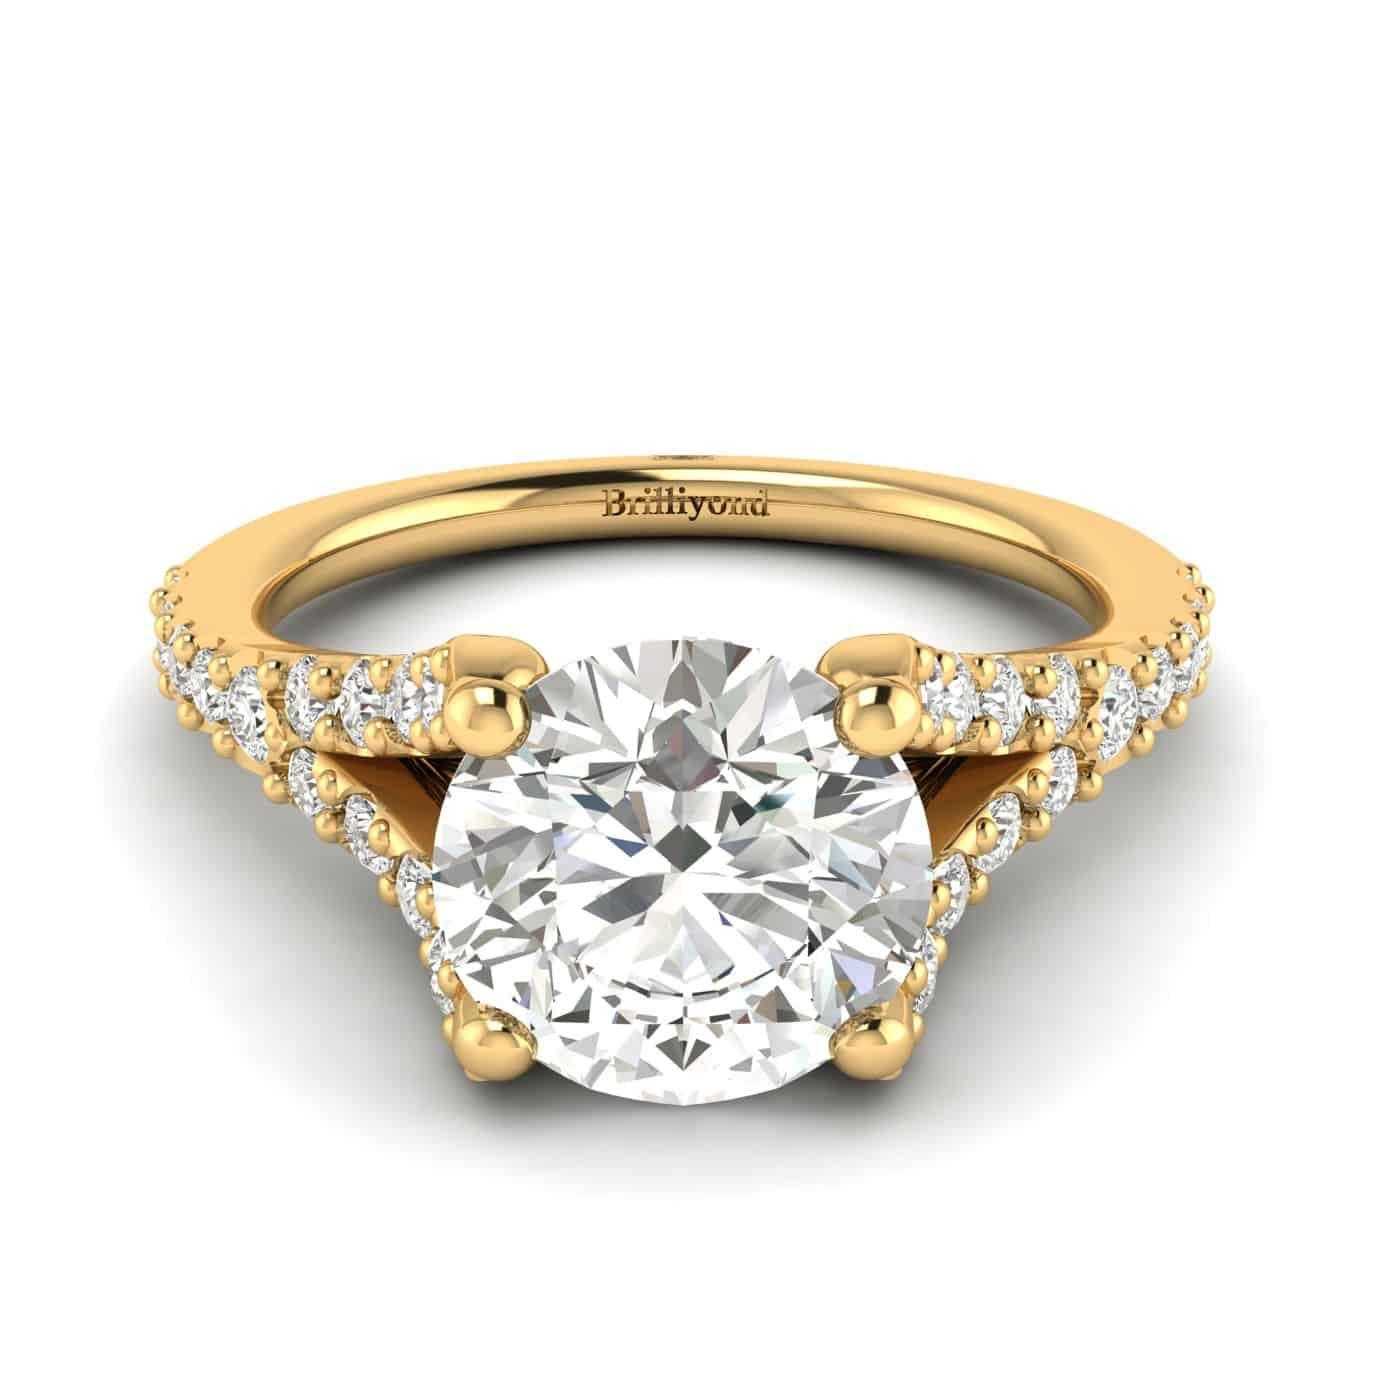 Shimmering 26 white created diamond accent stones in a mesmerising pavé split shank setting.